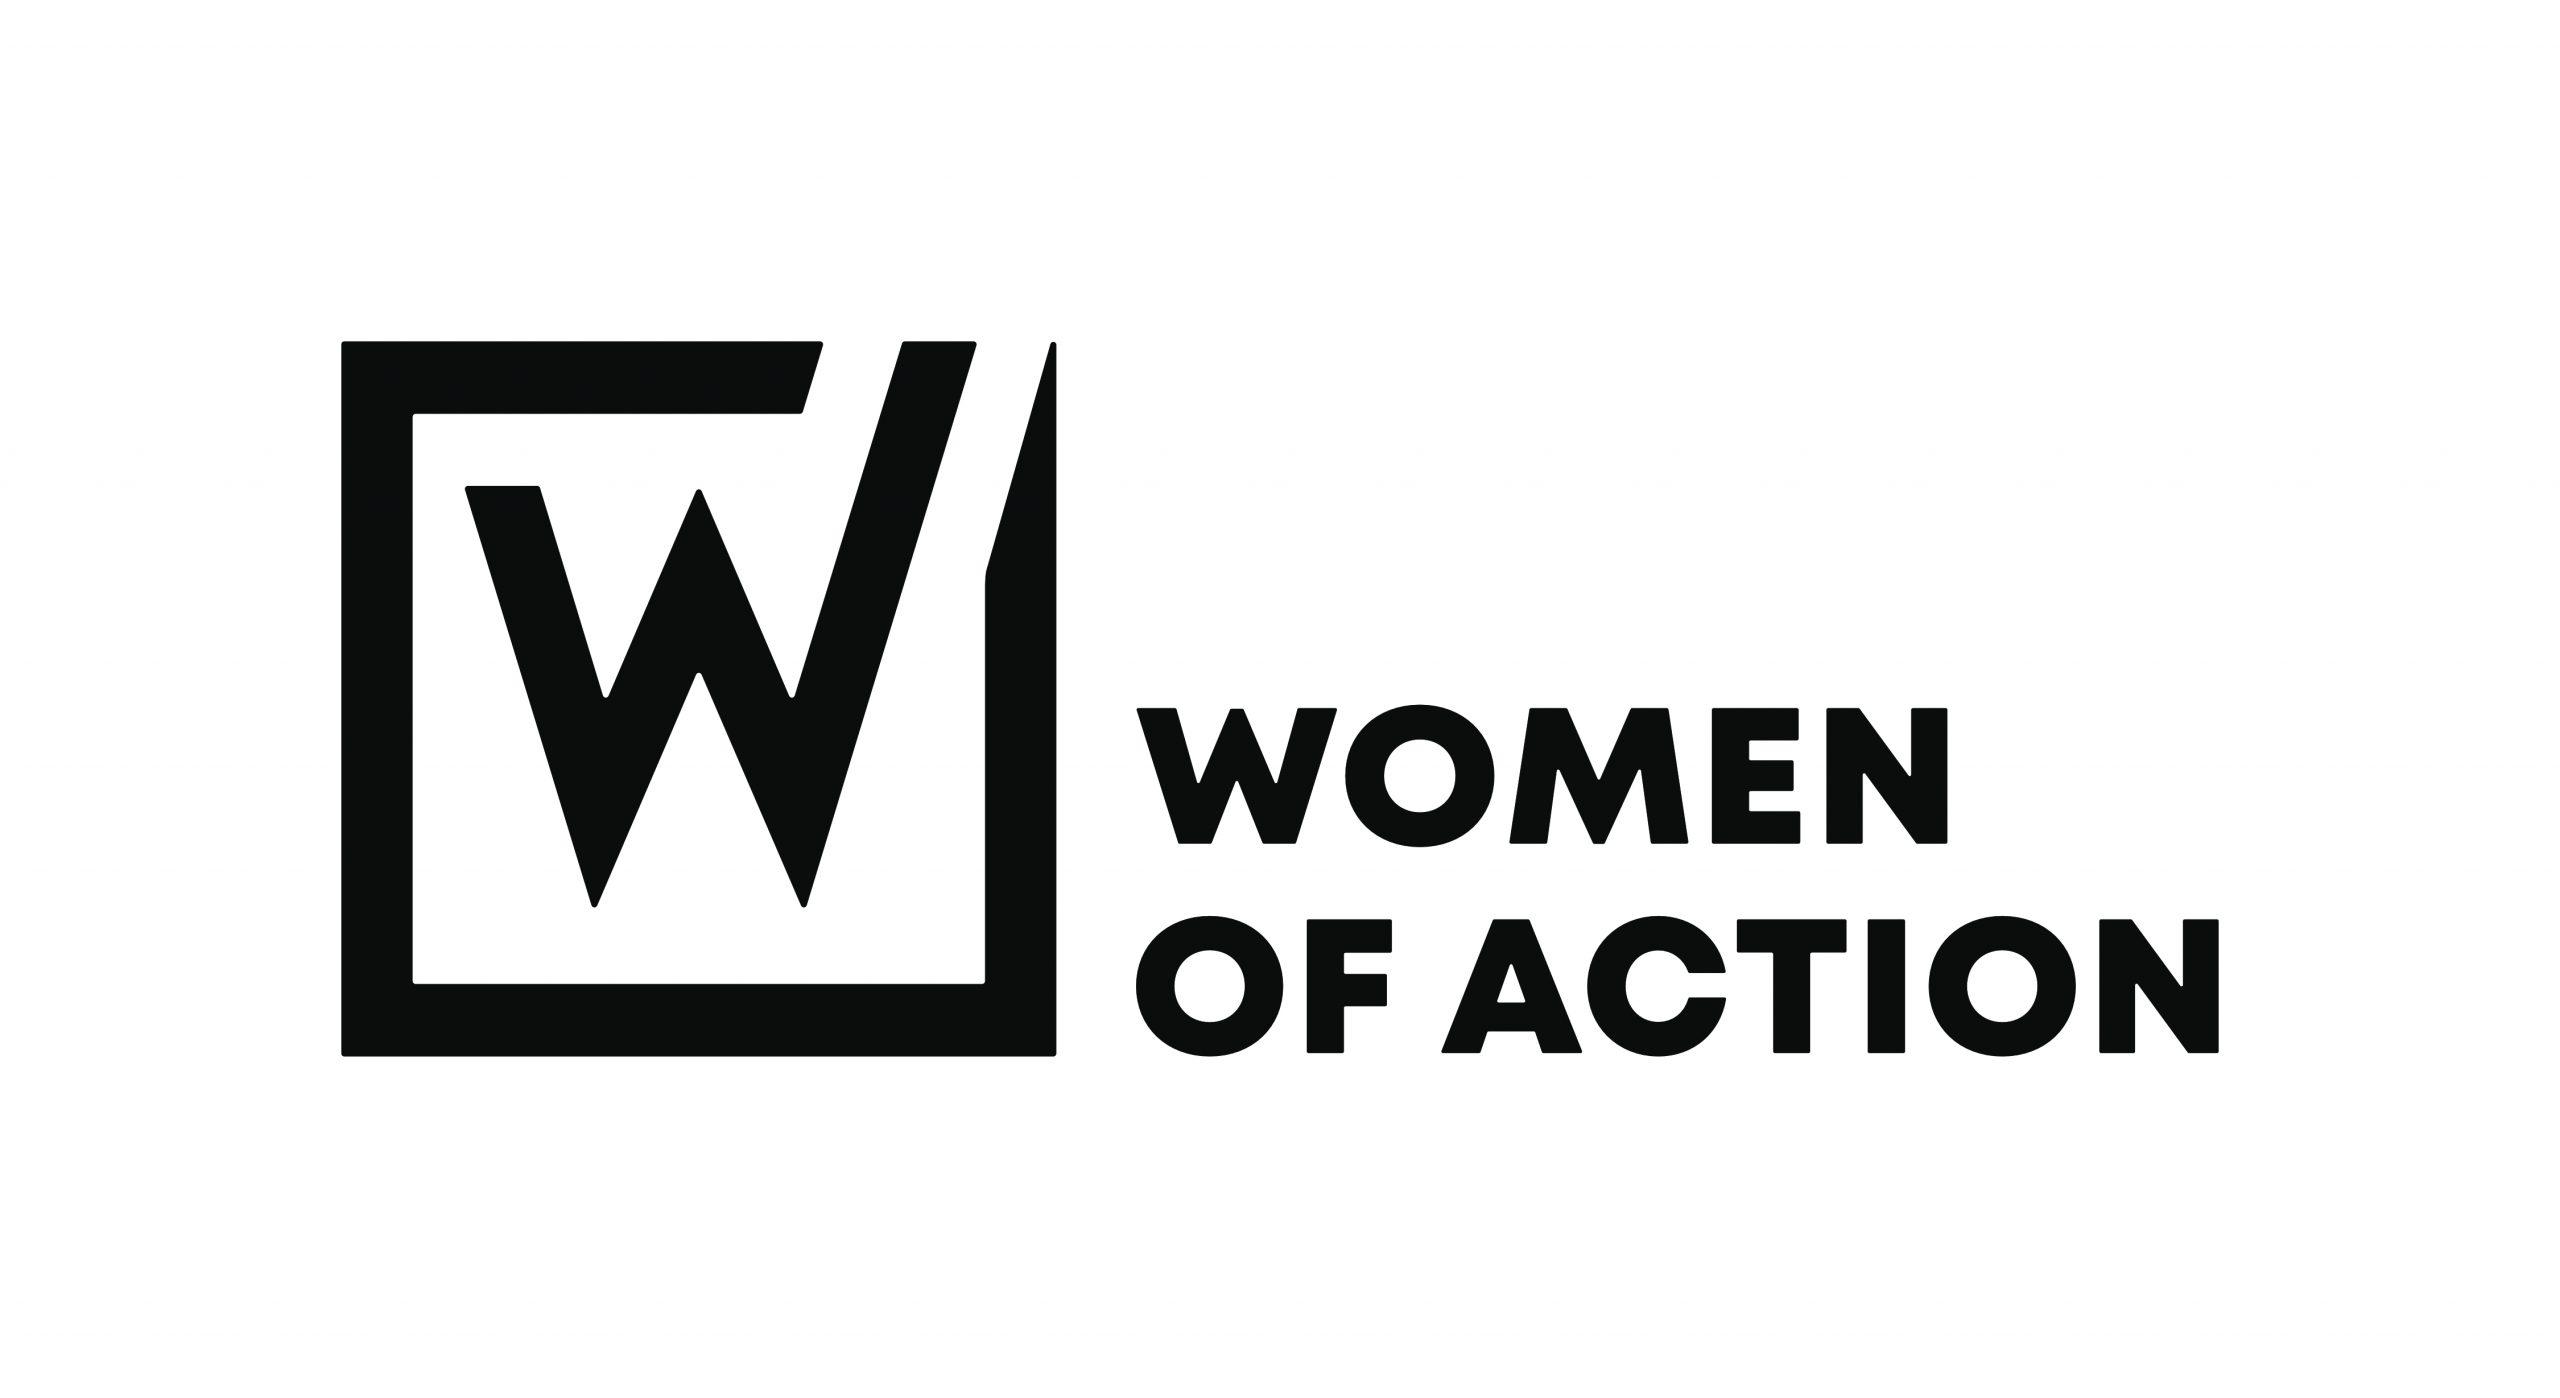 Women of Action || Winston-Salem, NC